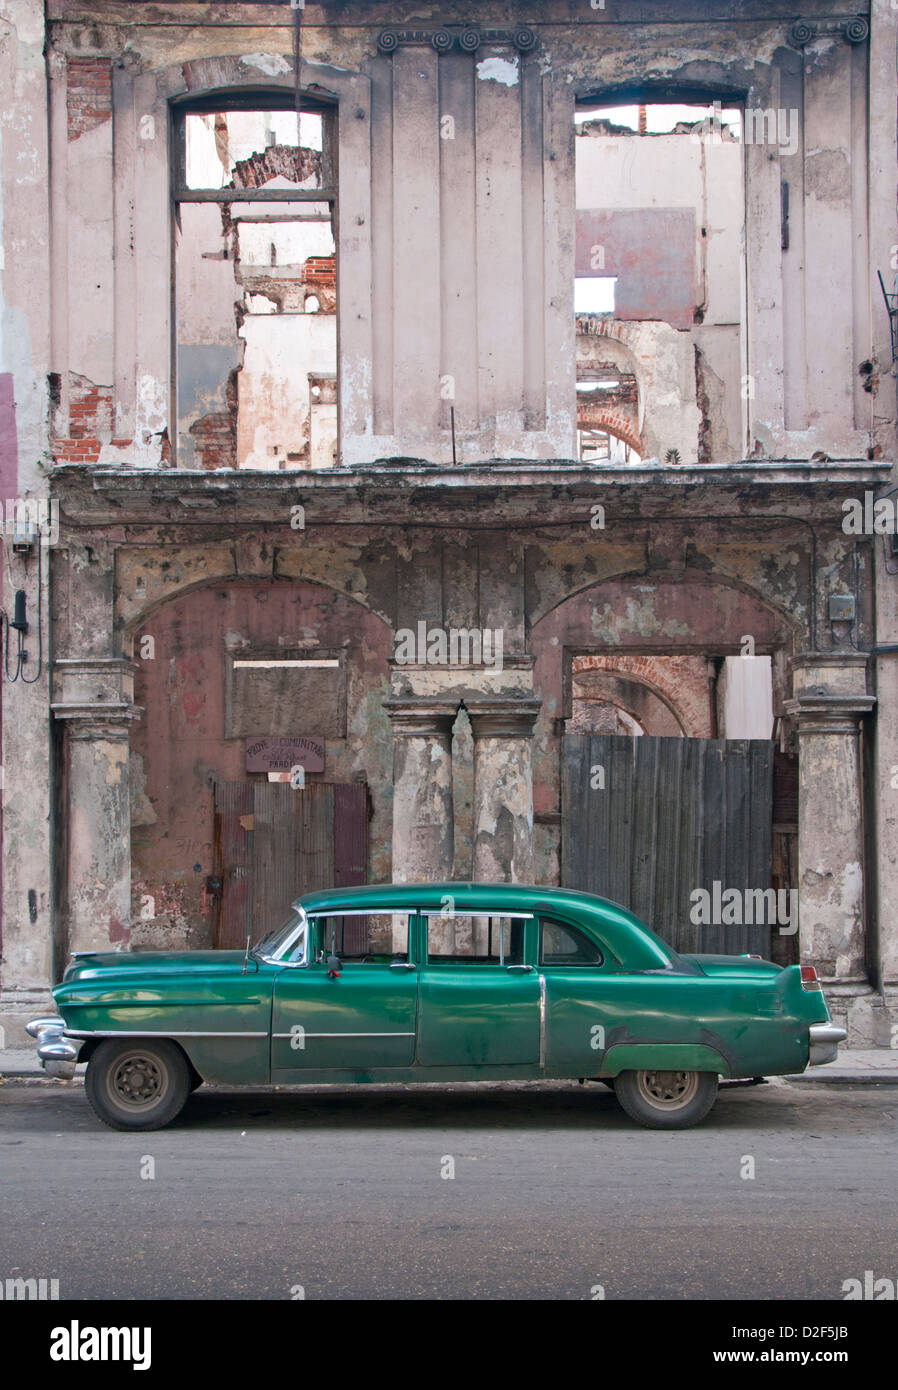 Alte amerikanische 1950er Jahre Oldtimer vor Dilapidated Gebäude, Paseo del Prado, Centro Habana, Havana, Kuba Stockbild